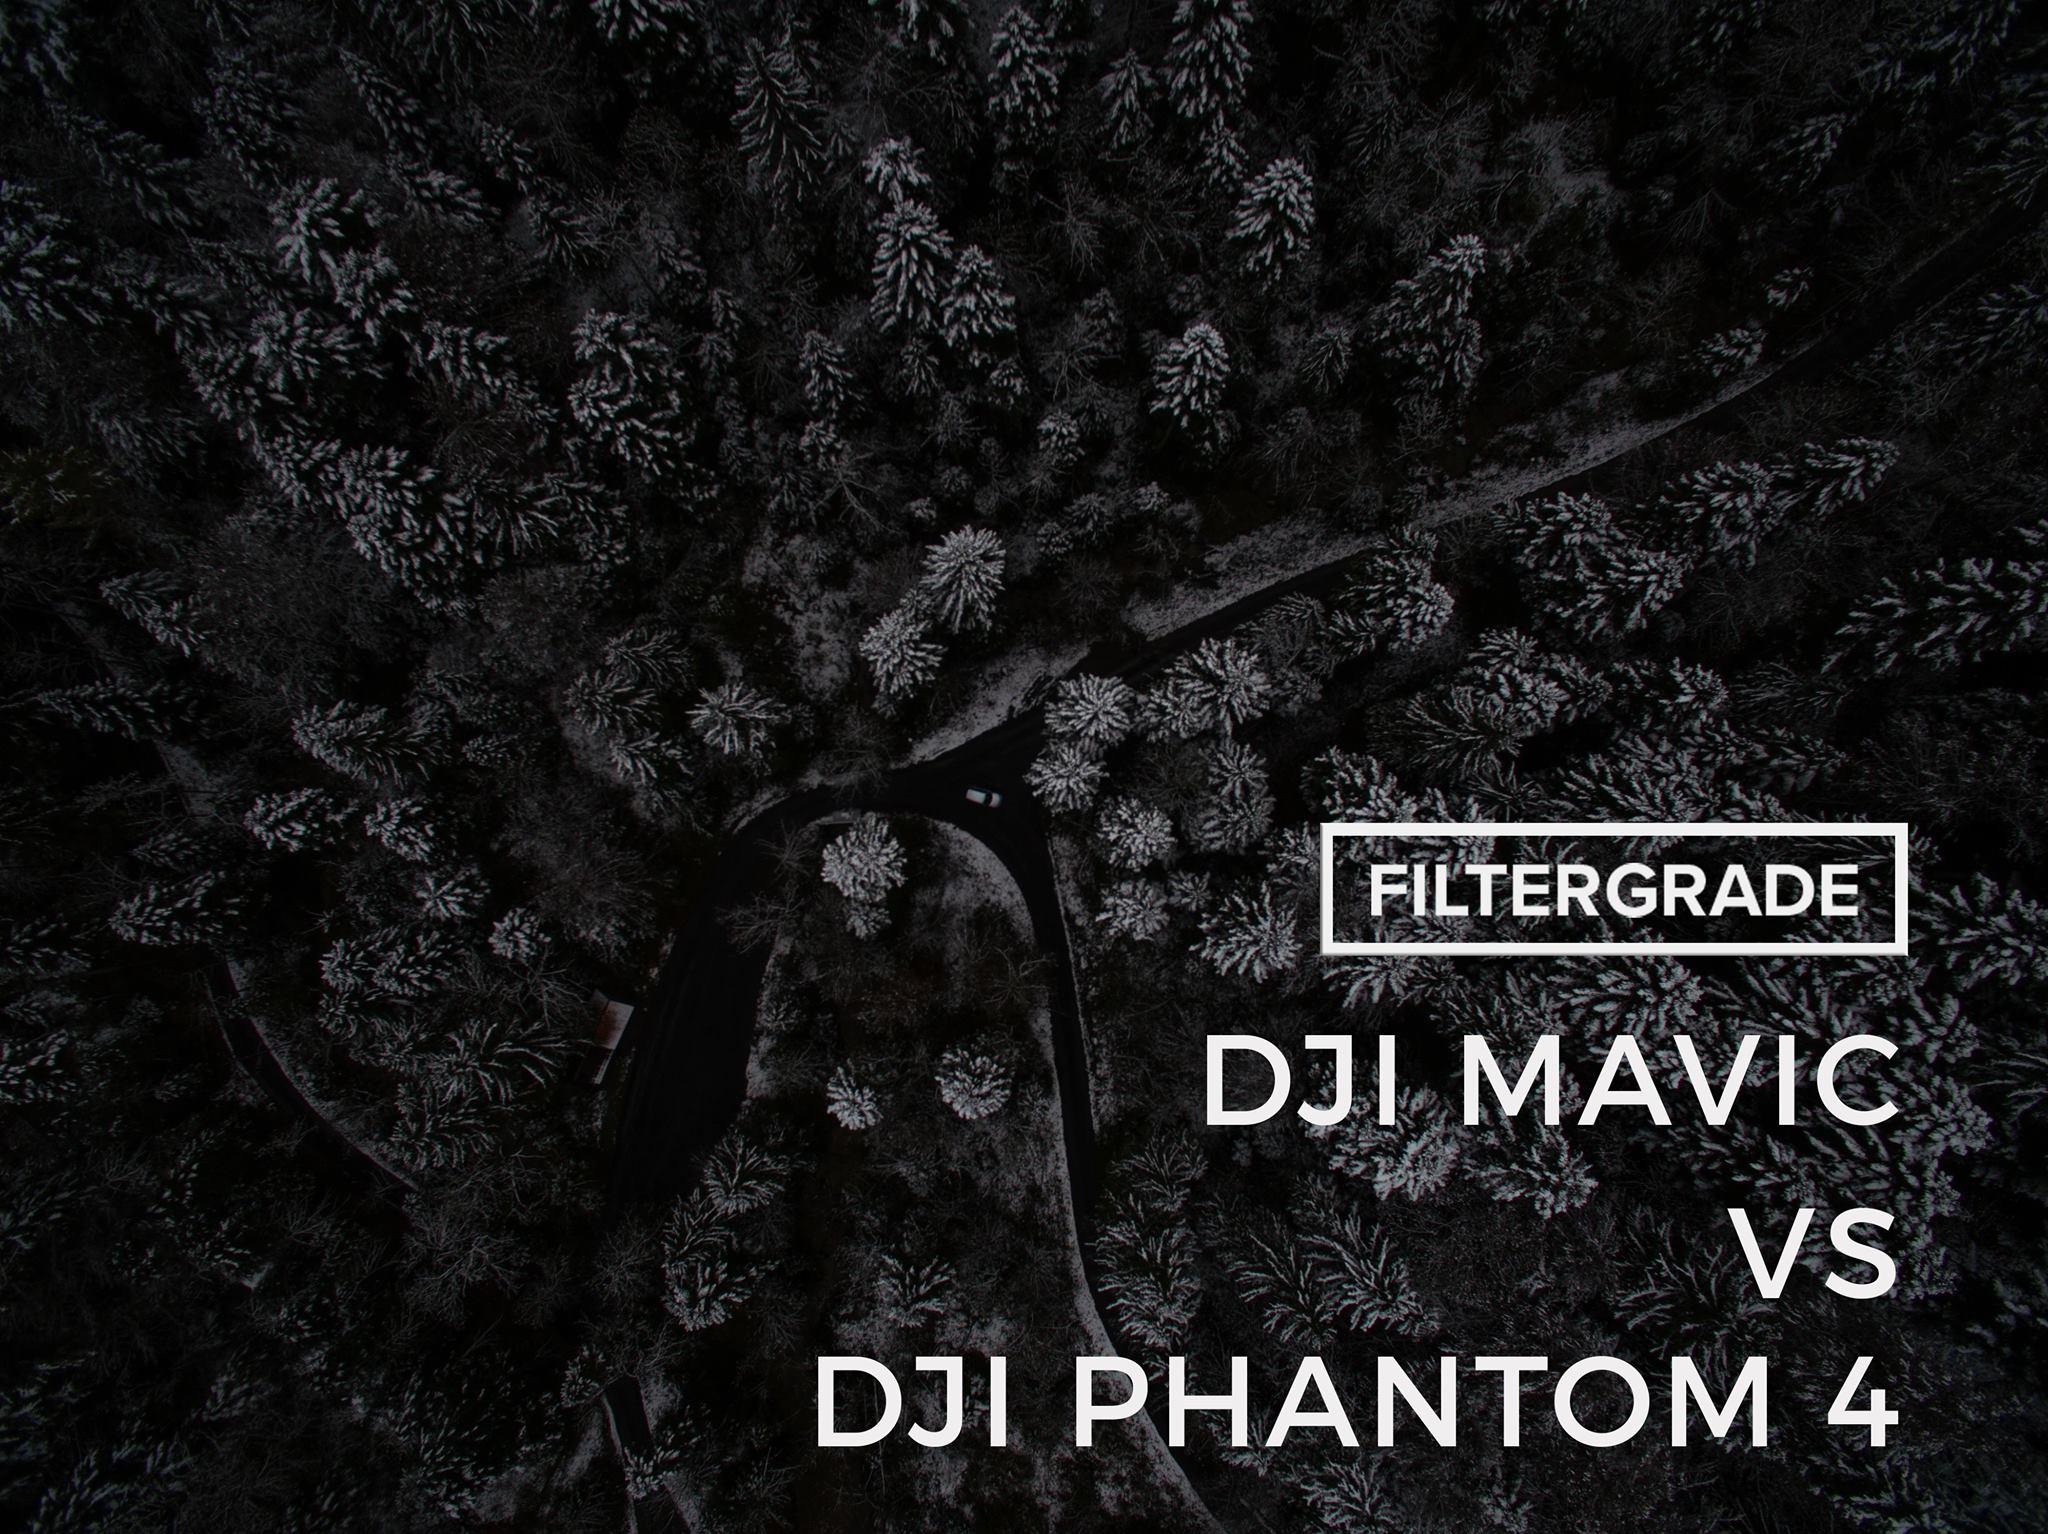 The DJI Mavic VS the DJI Phantom 4